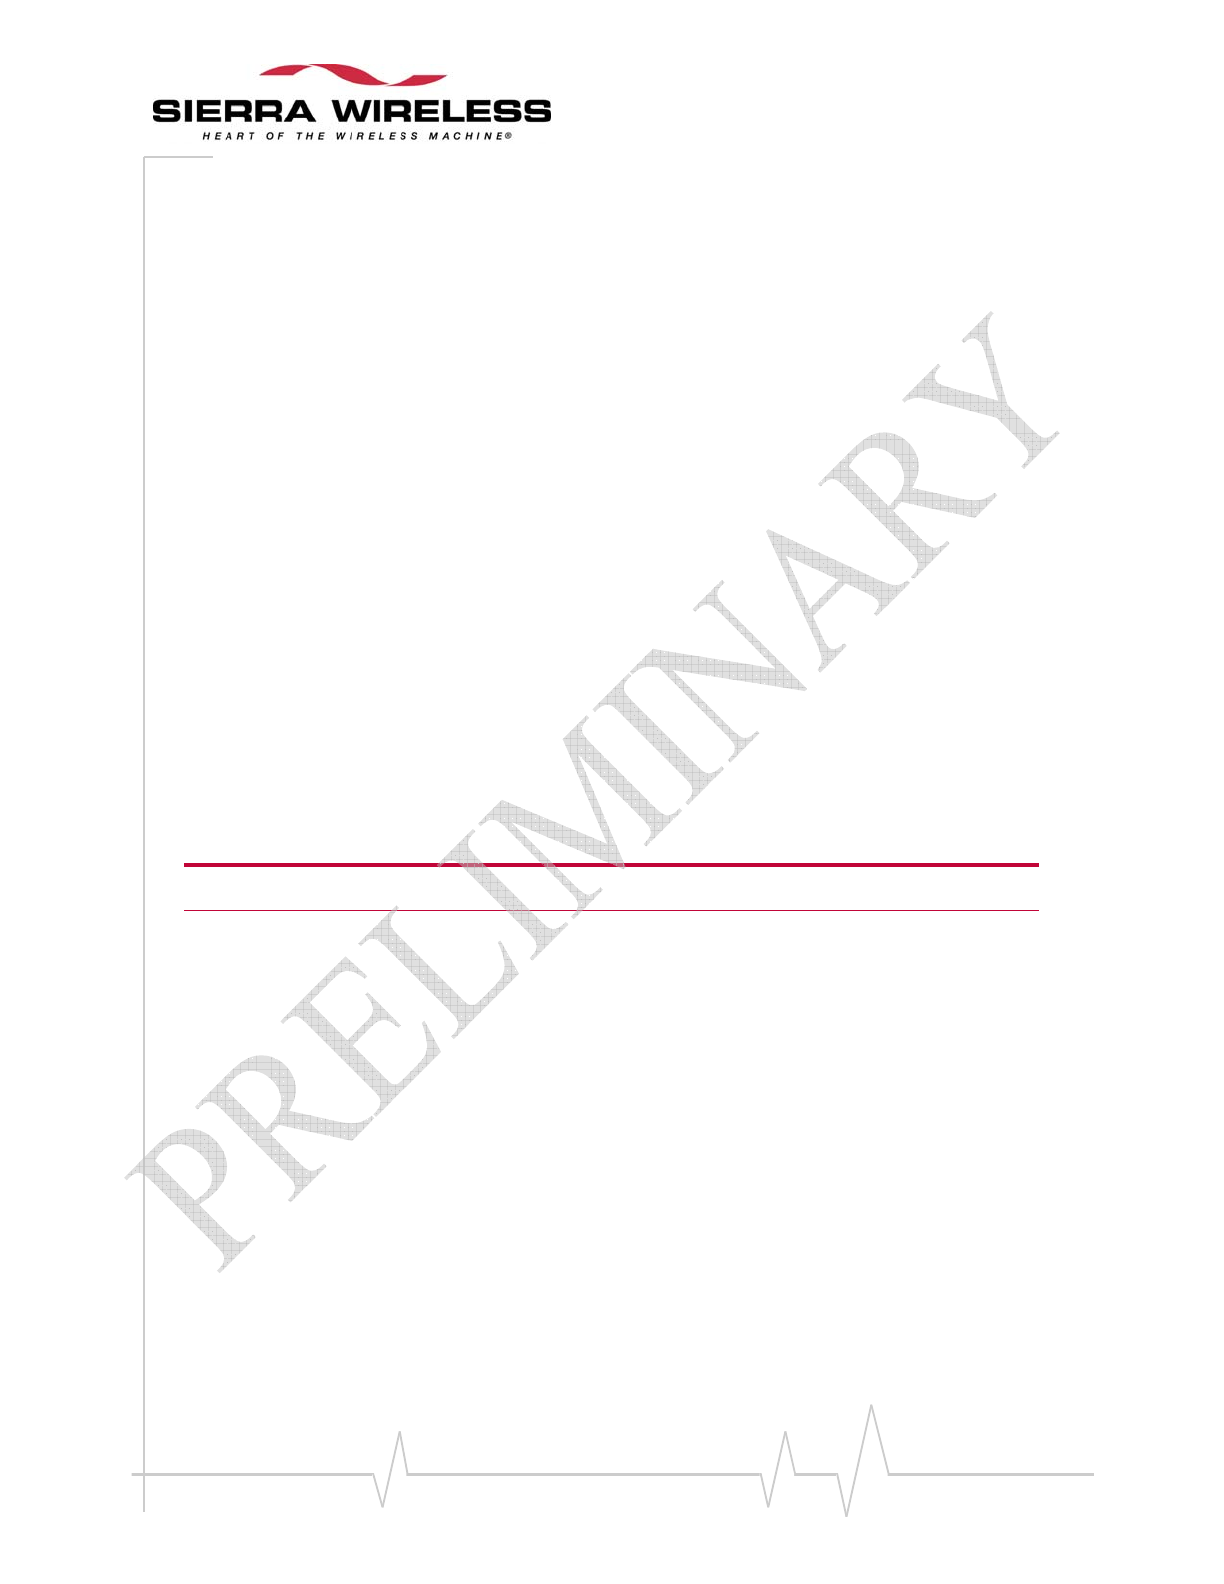 Sierra Wireless WISMO228 MODULE User Manual USERS MANUAL 1